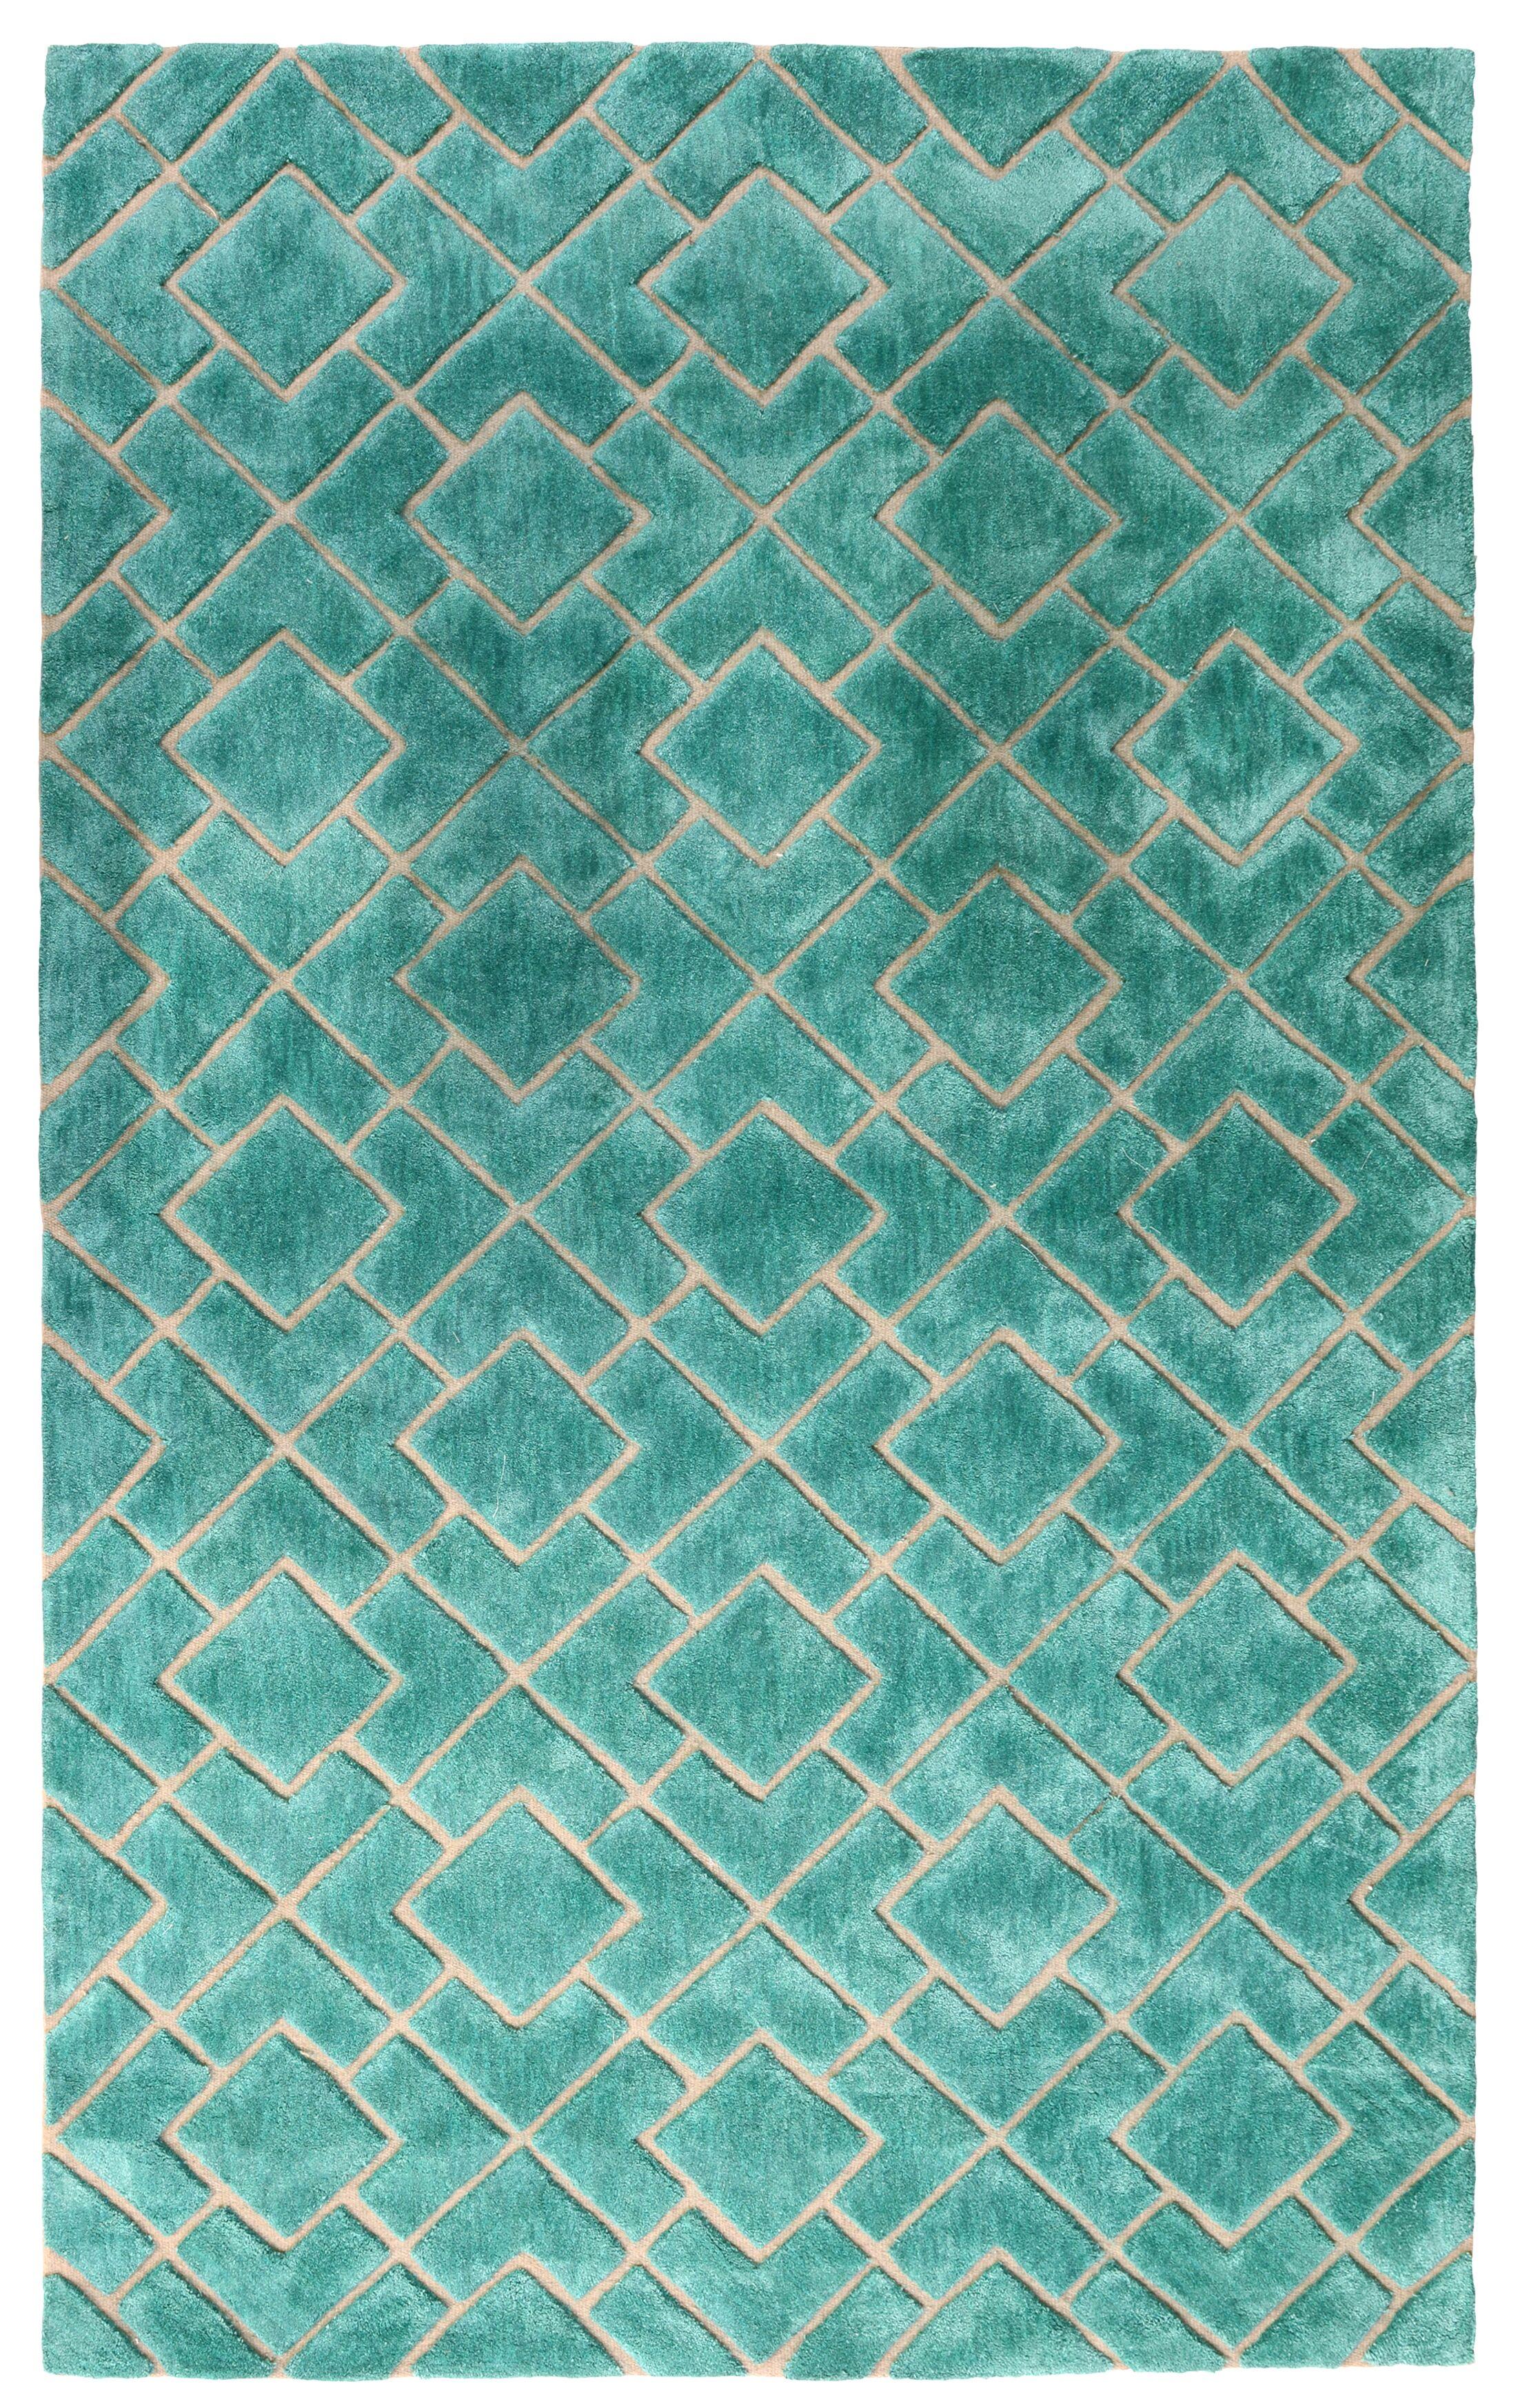 Karolinka Hand-Tufted Royal Turquoise Area Rug Rug Size: 5' x 8'